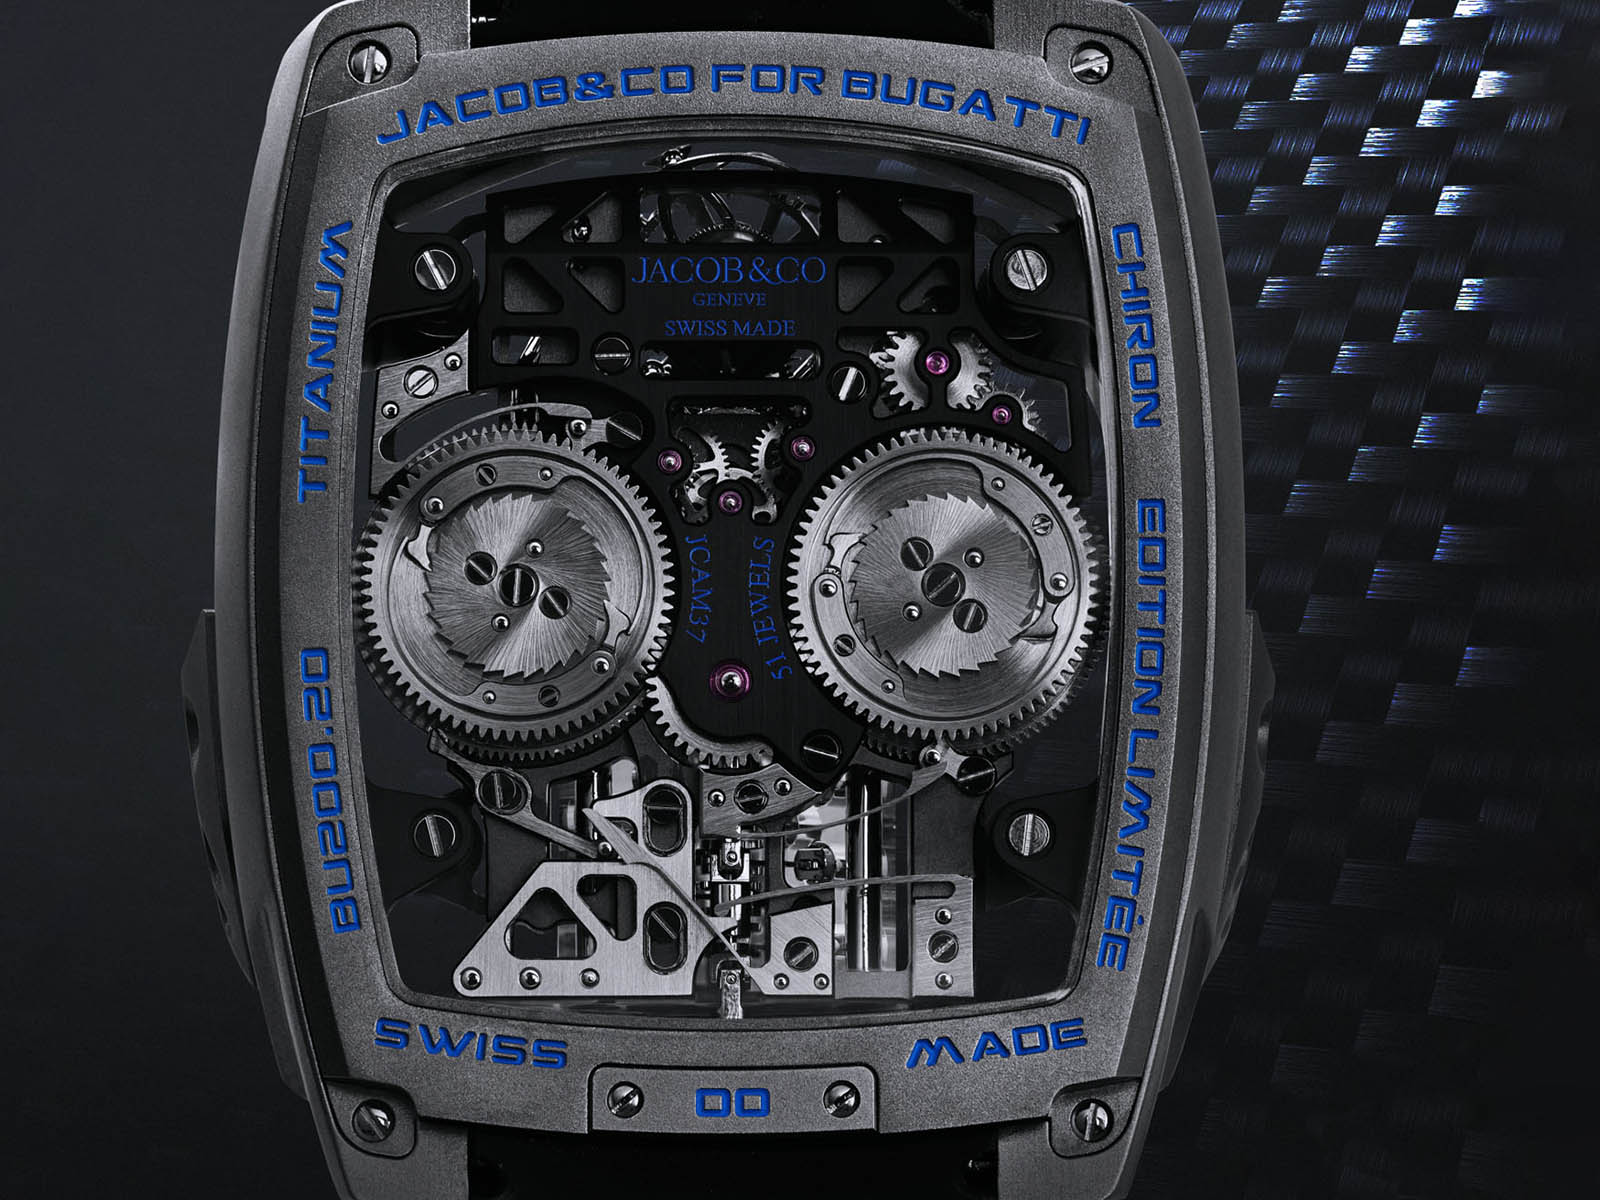 af321-40-ba-ad-absaa-jacob-co-bugatti-chiron-tourbillon-5.jpg